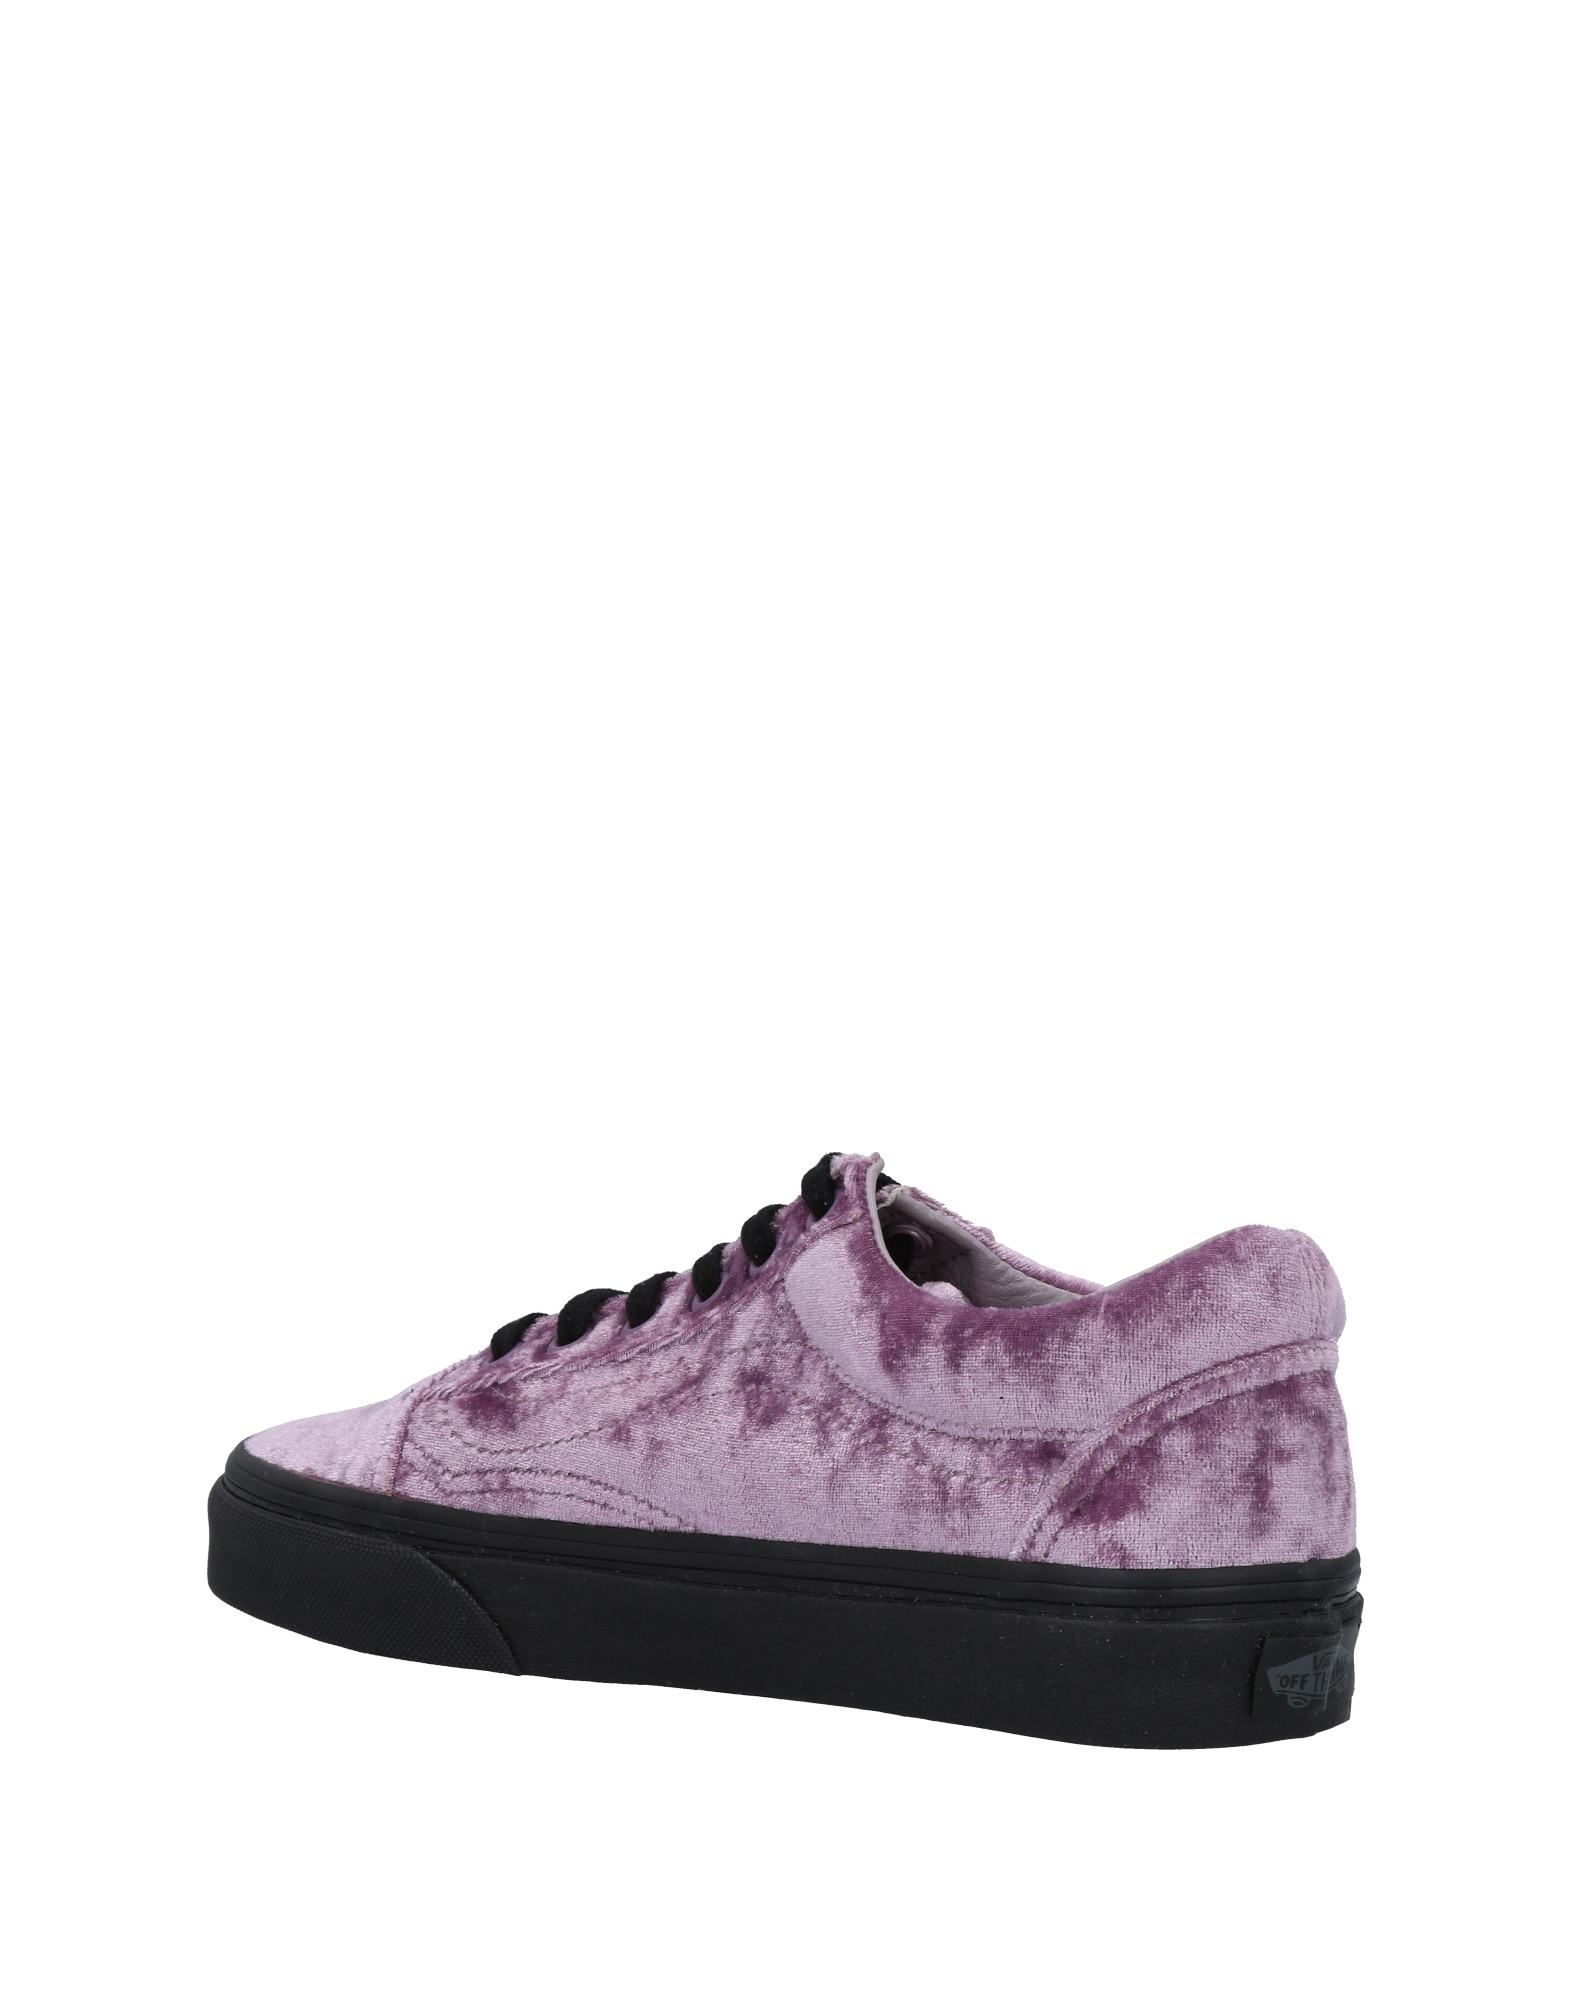 Vans Sneakers Damen  11494277MJ Schuhe Heiße Schuhe 11494277MJ f00434